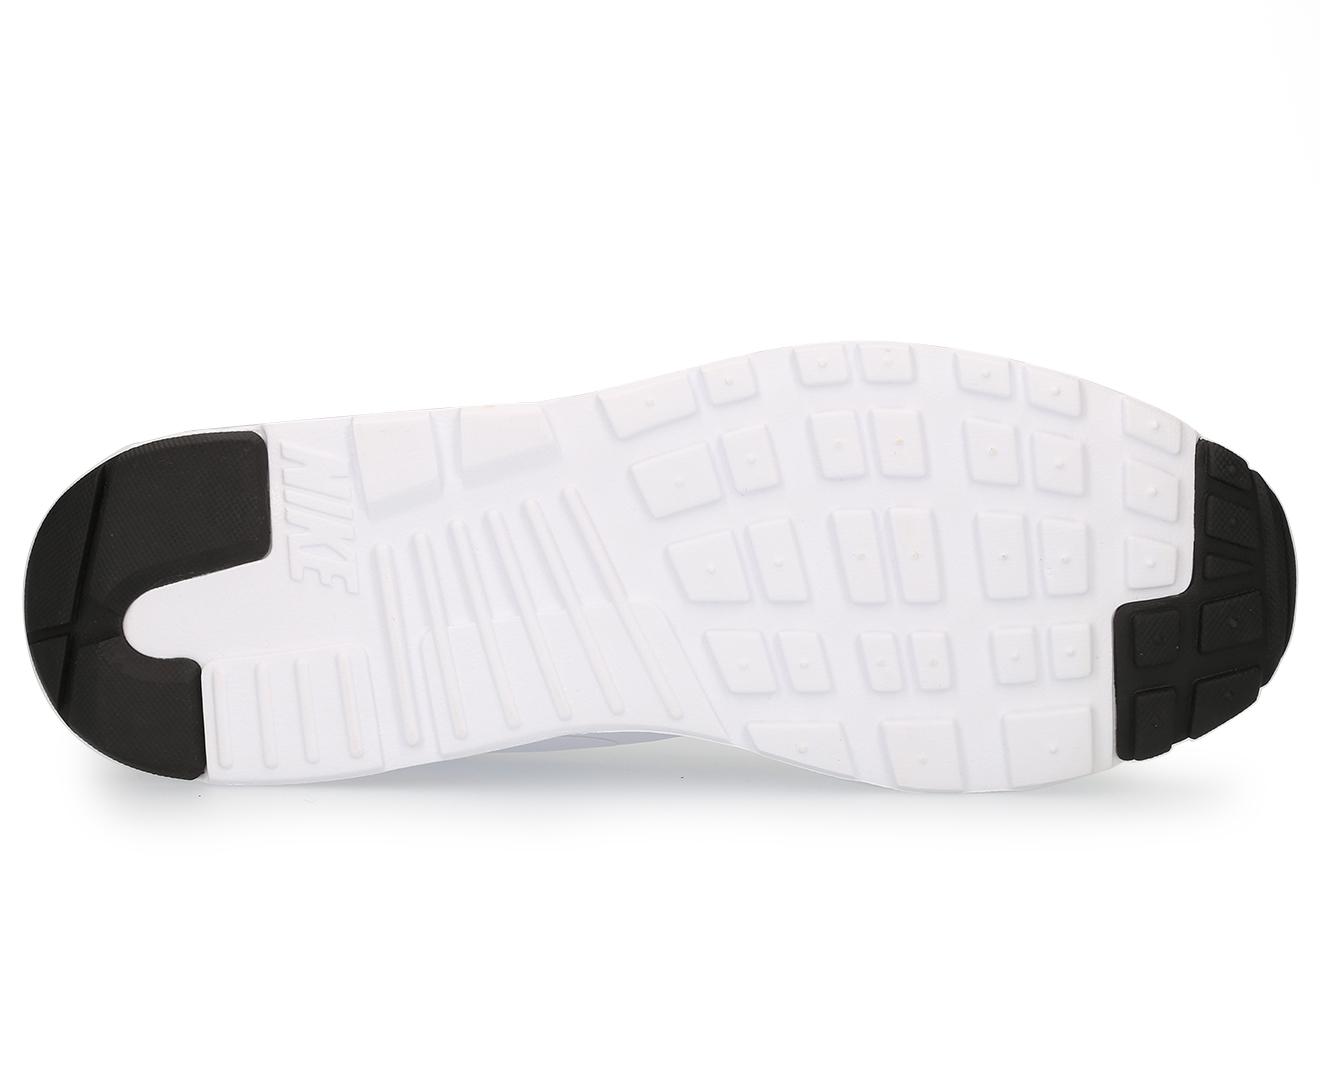 Nike Men's Air Max Vision Shoe WhitePure Platinum